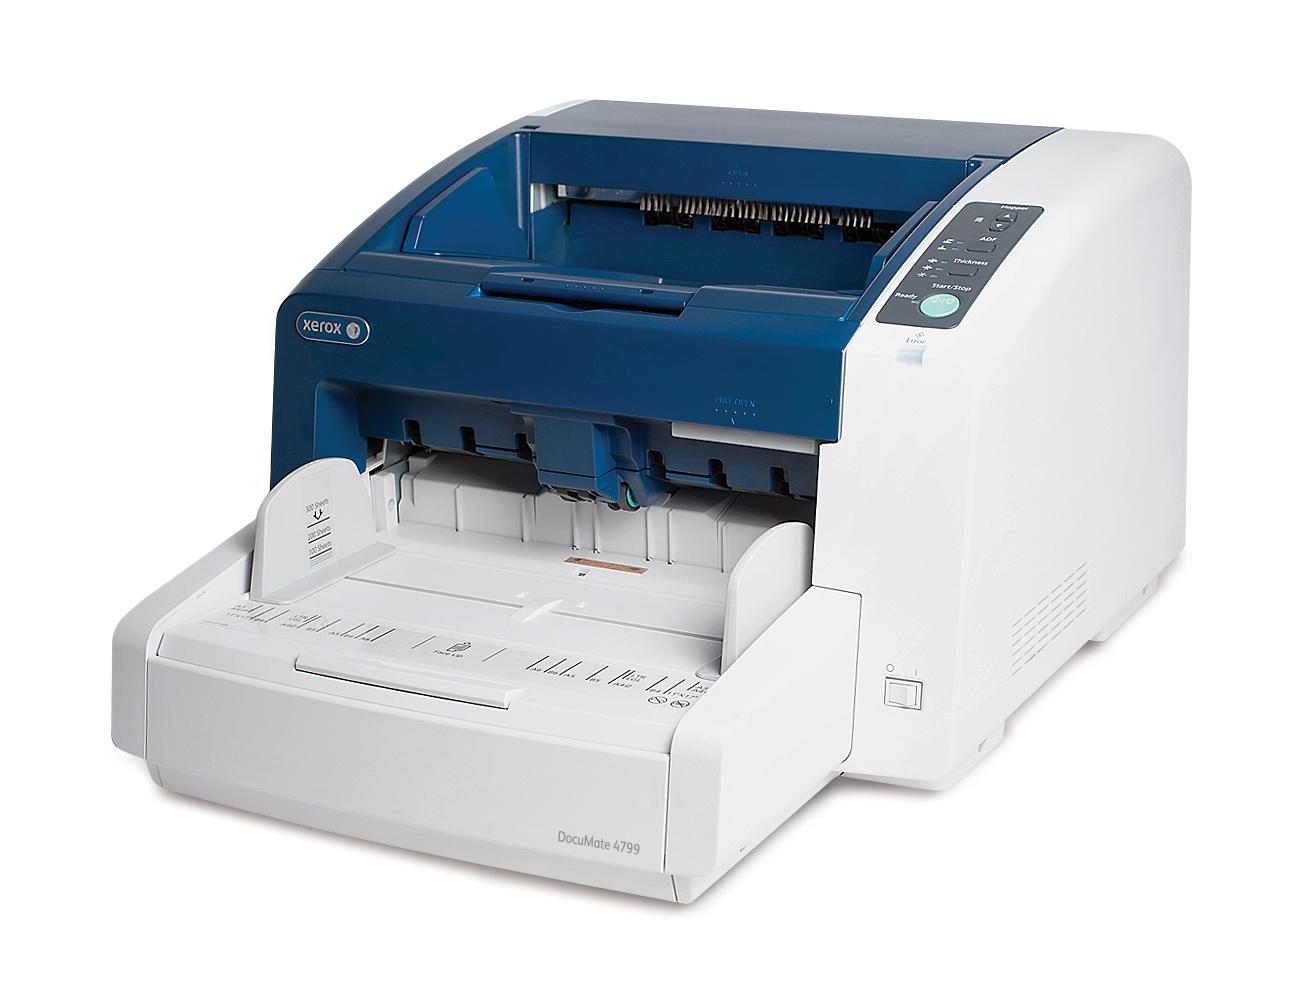 Xerox Documate 4799 Document Network Services Ltd